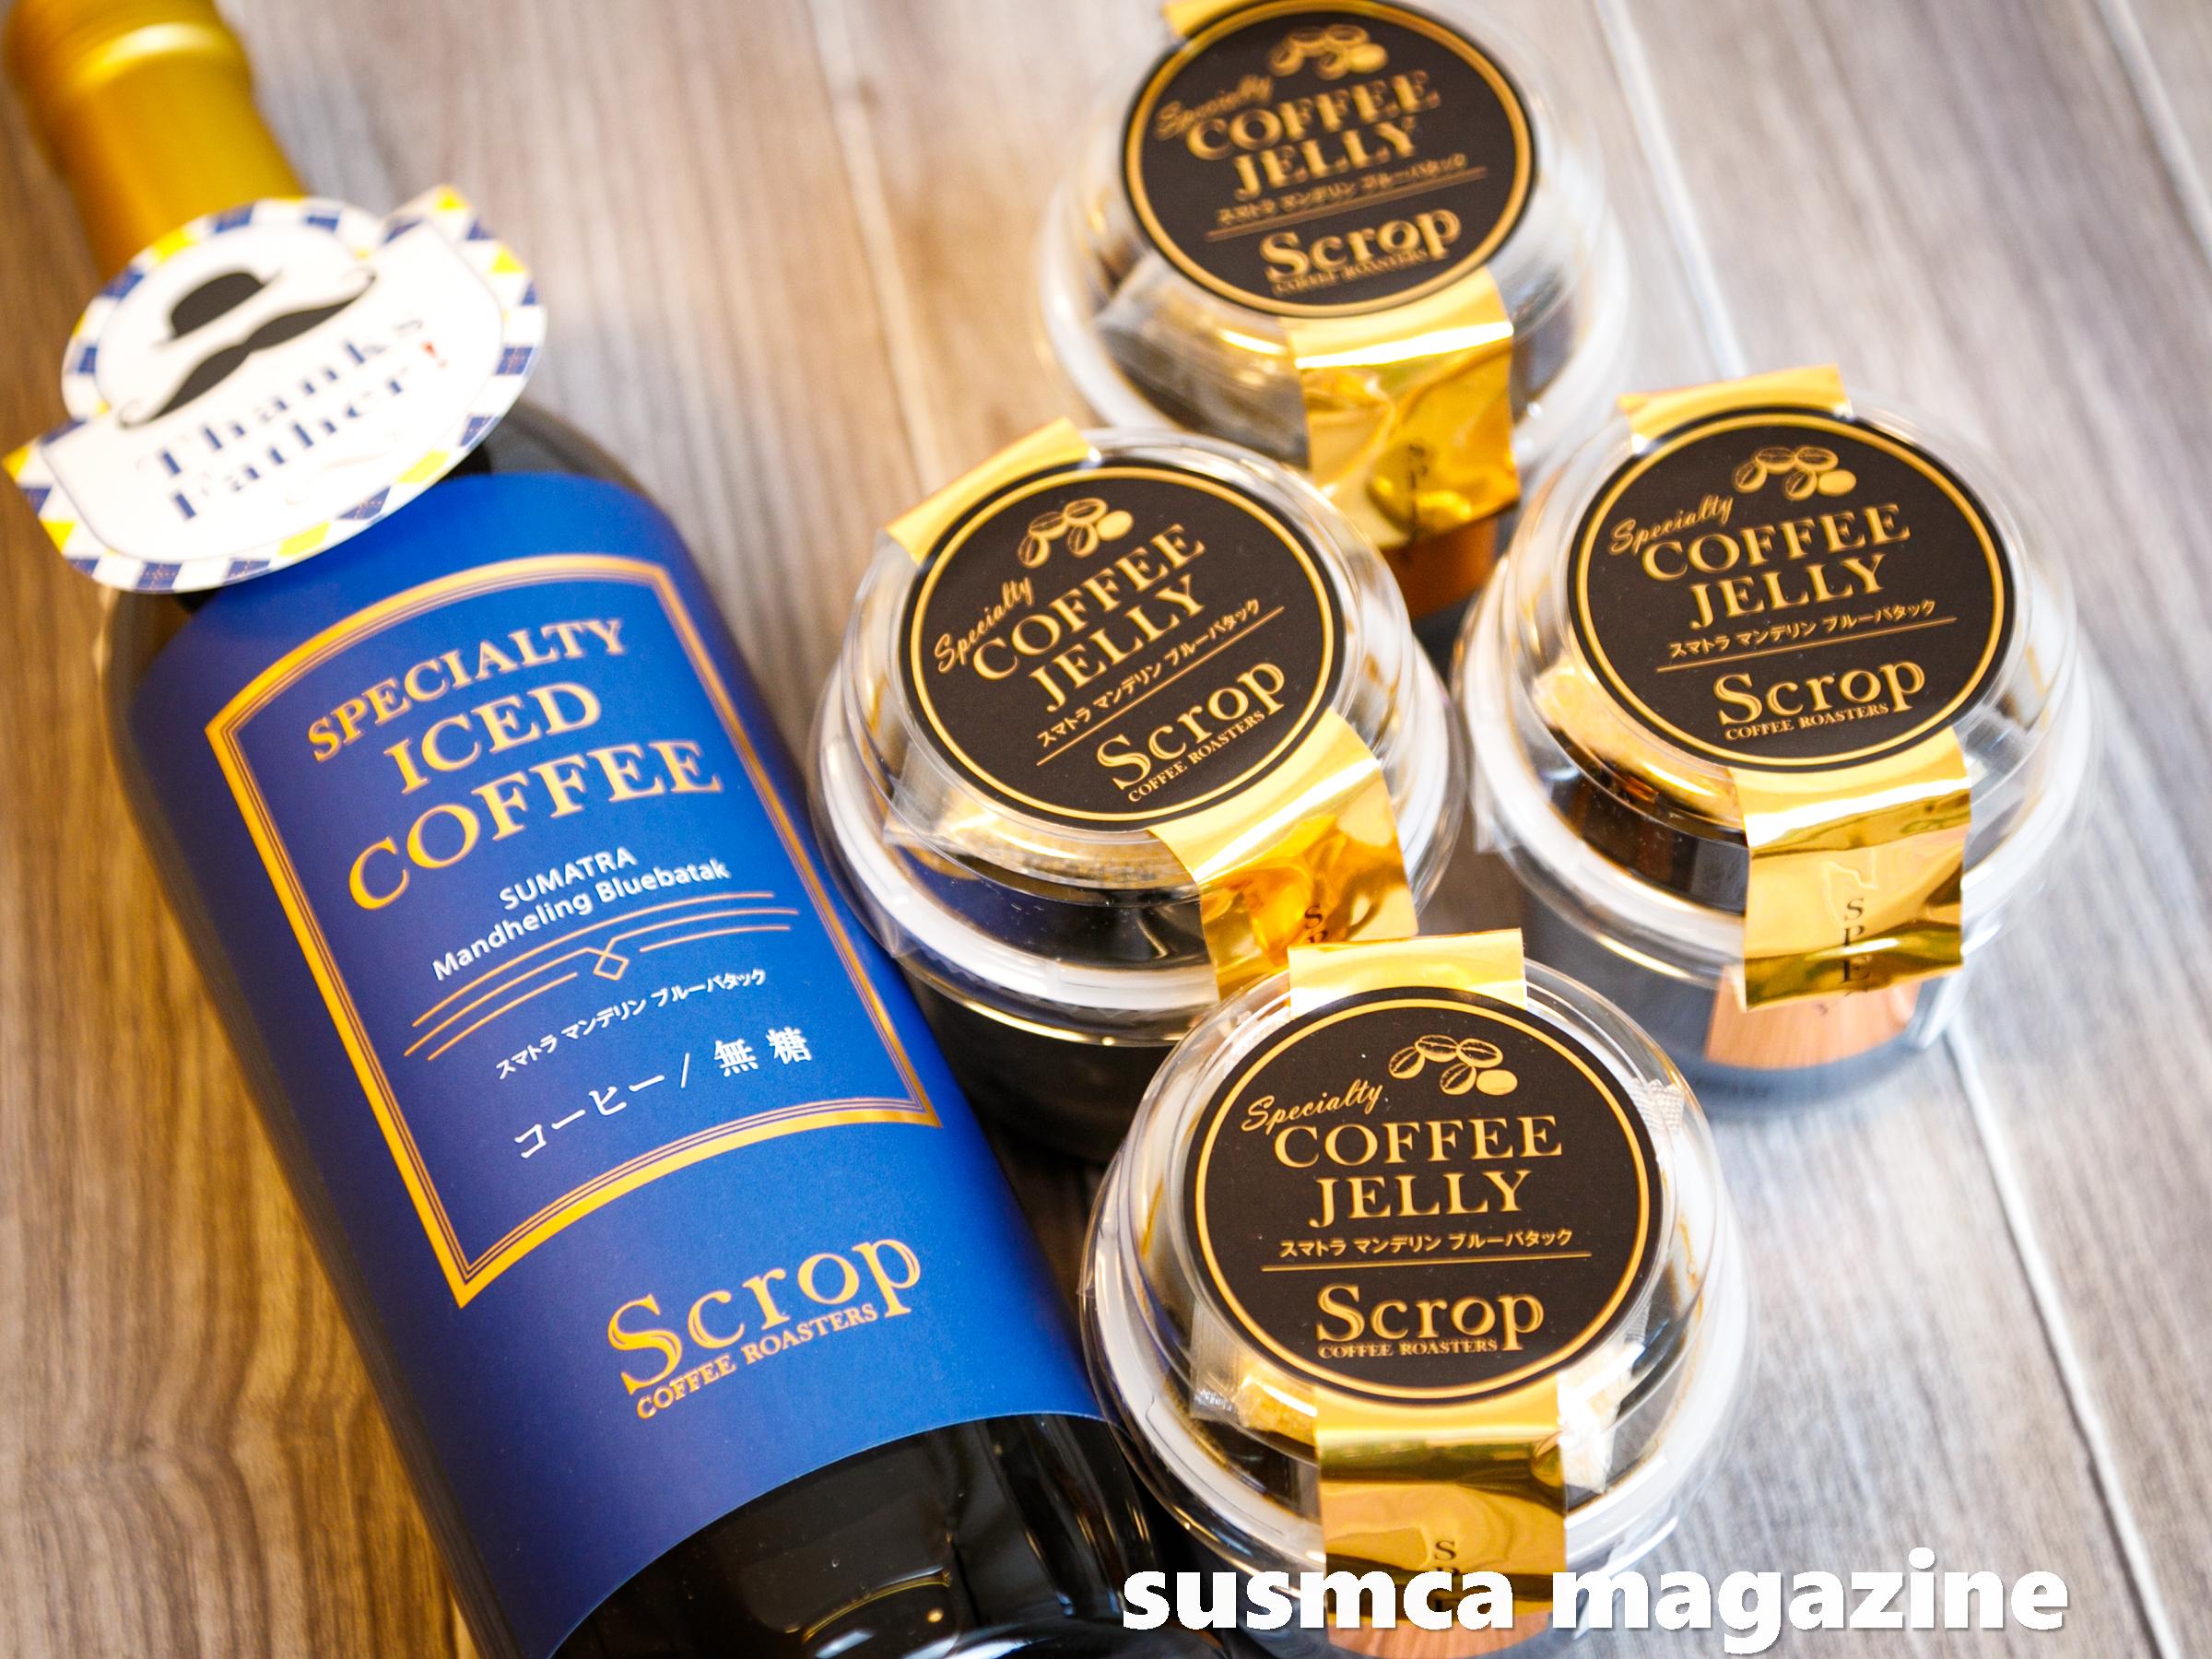 Scrop COFFEE ROASTERS「父の日のスペシャルティコーヒーギフト」を試飲 スッキリした飲み口に驚き!